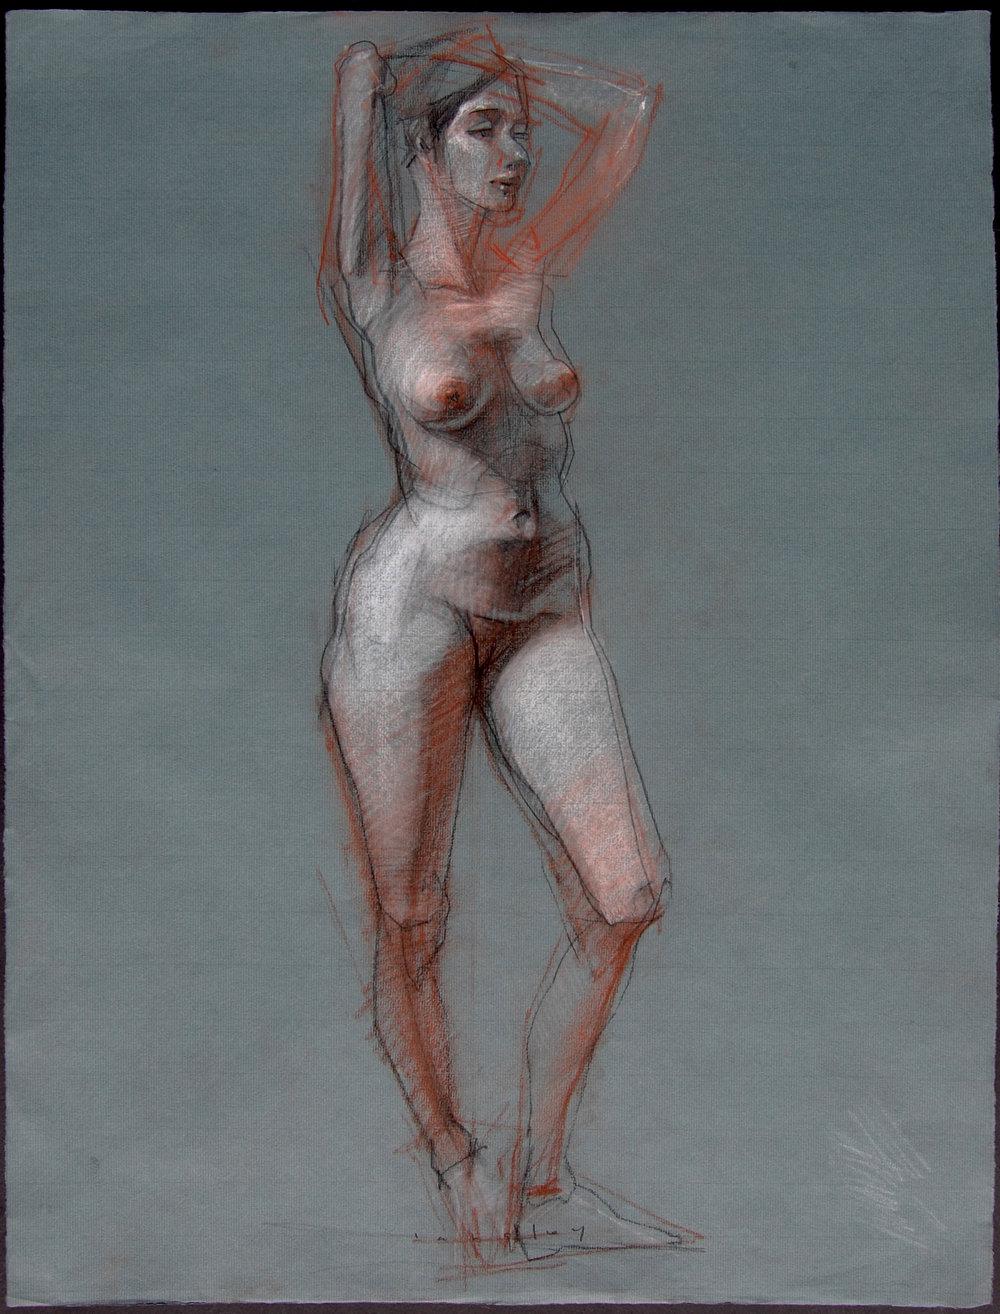 langley nude conte 24x18 Gretchen handsonhead.jpg